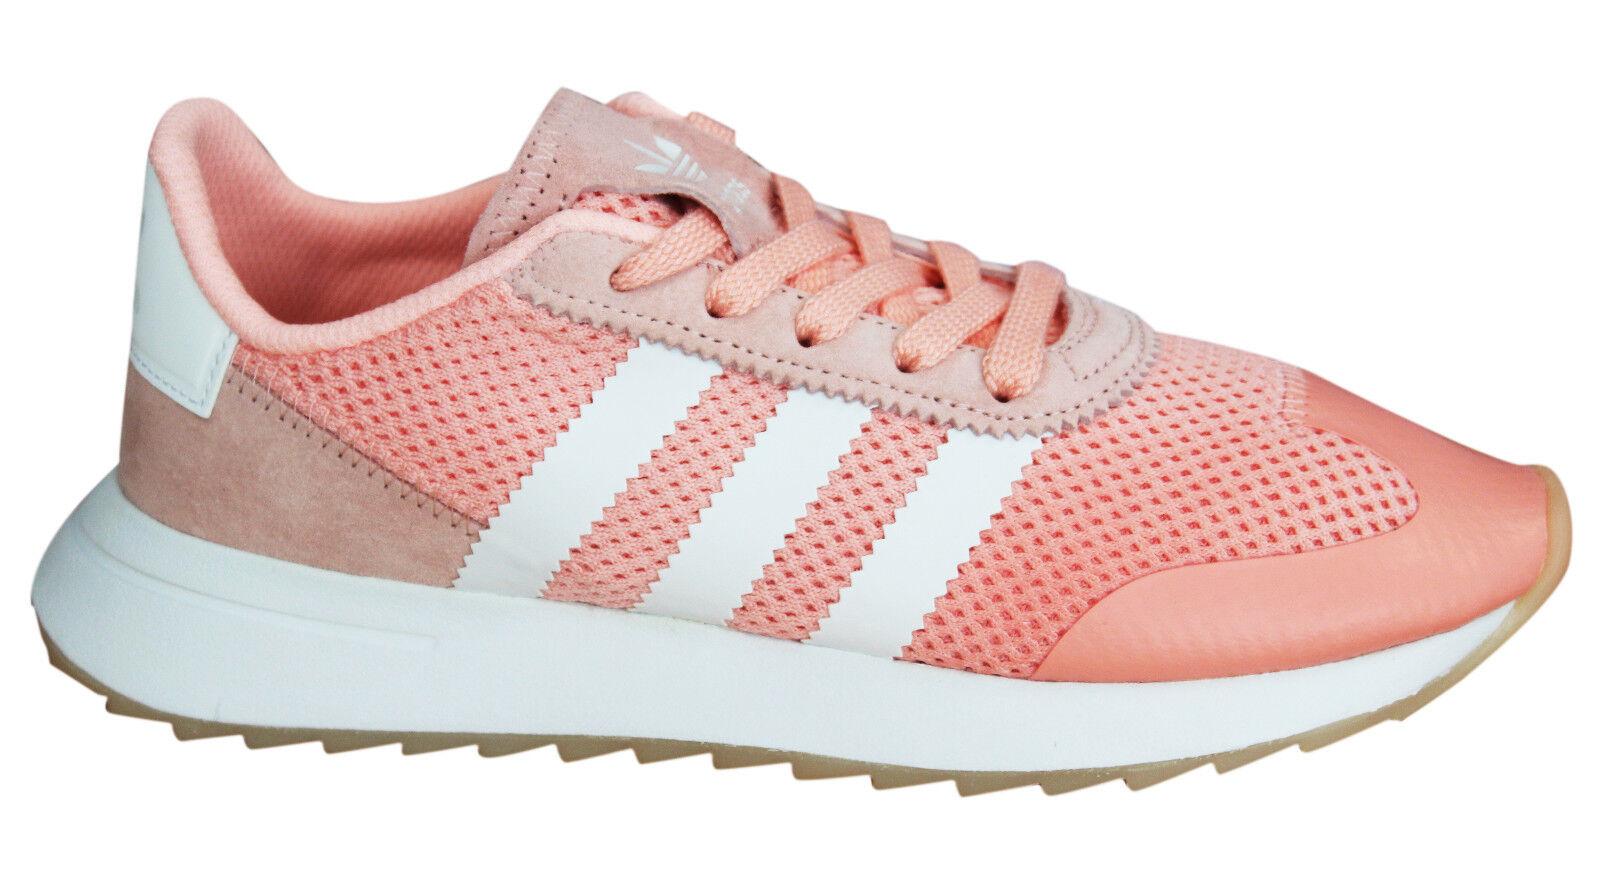 Adidas originali originali originali flashrunner donne formatori merletto scarpe peach ba7759u45 | Design moderno  51dcc9